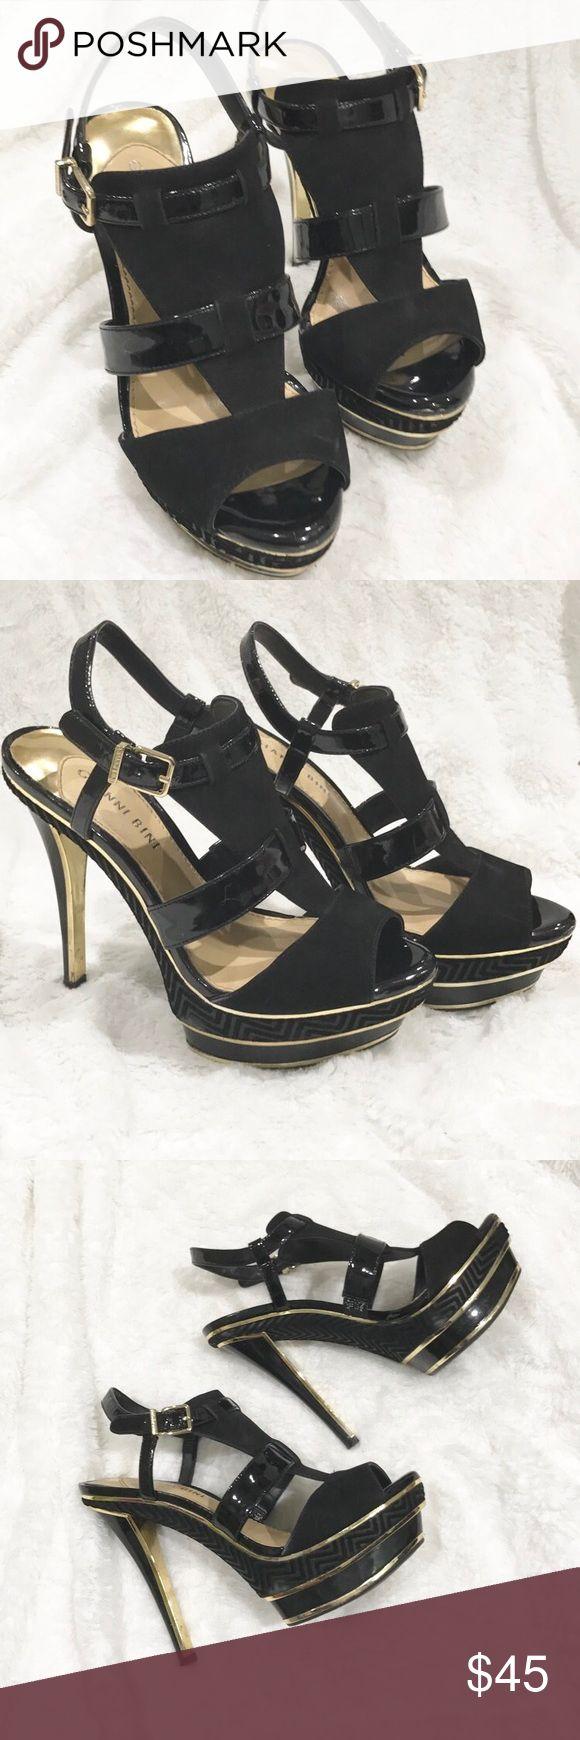 Gianni Bini Black Heels Practically new gianni bini heels Gianni Bini Shoes Heels